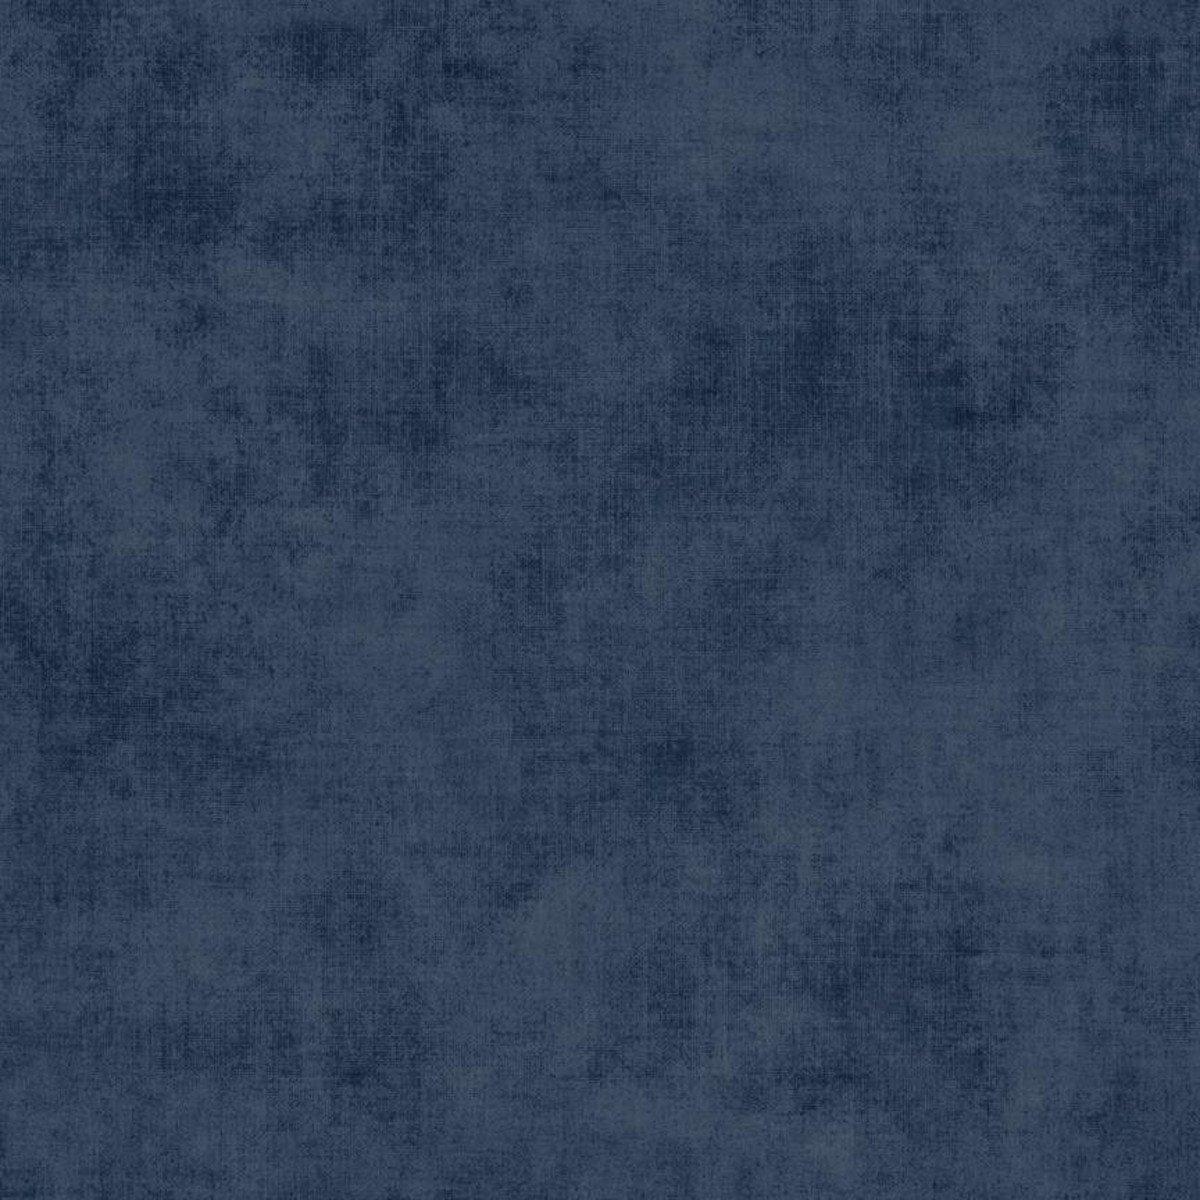 Flannel Shade - Nighttime